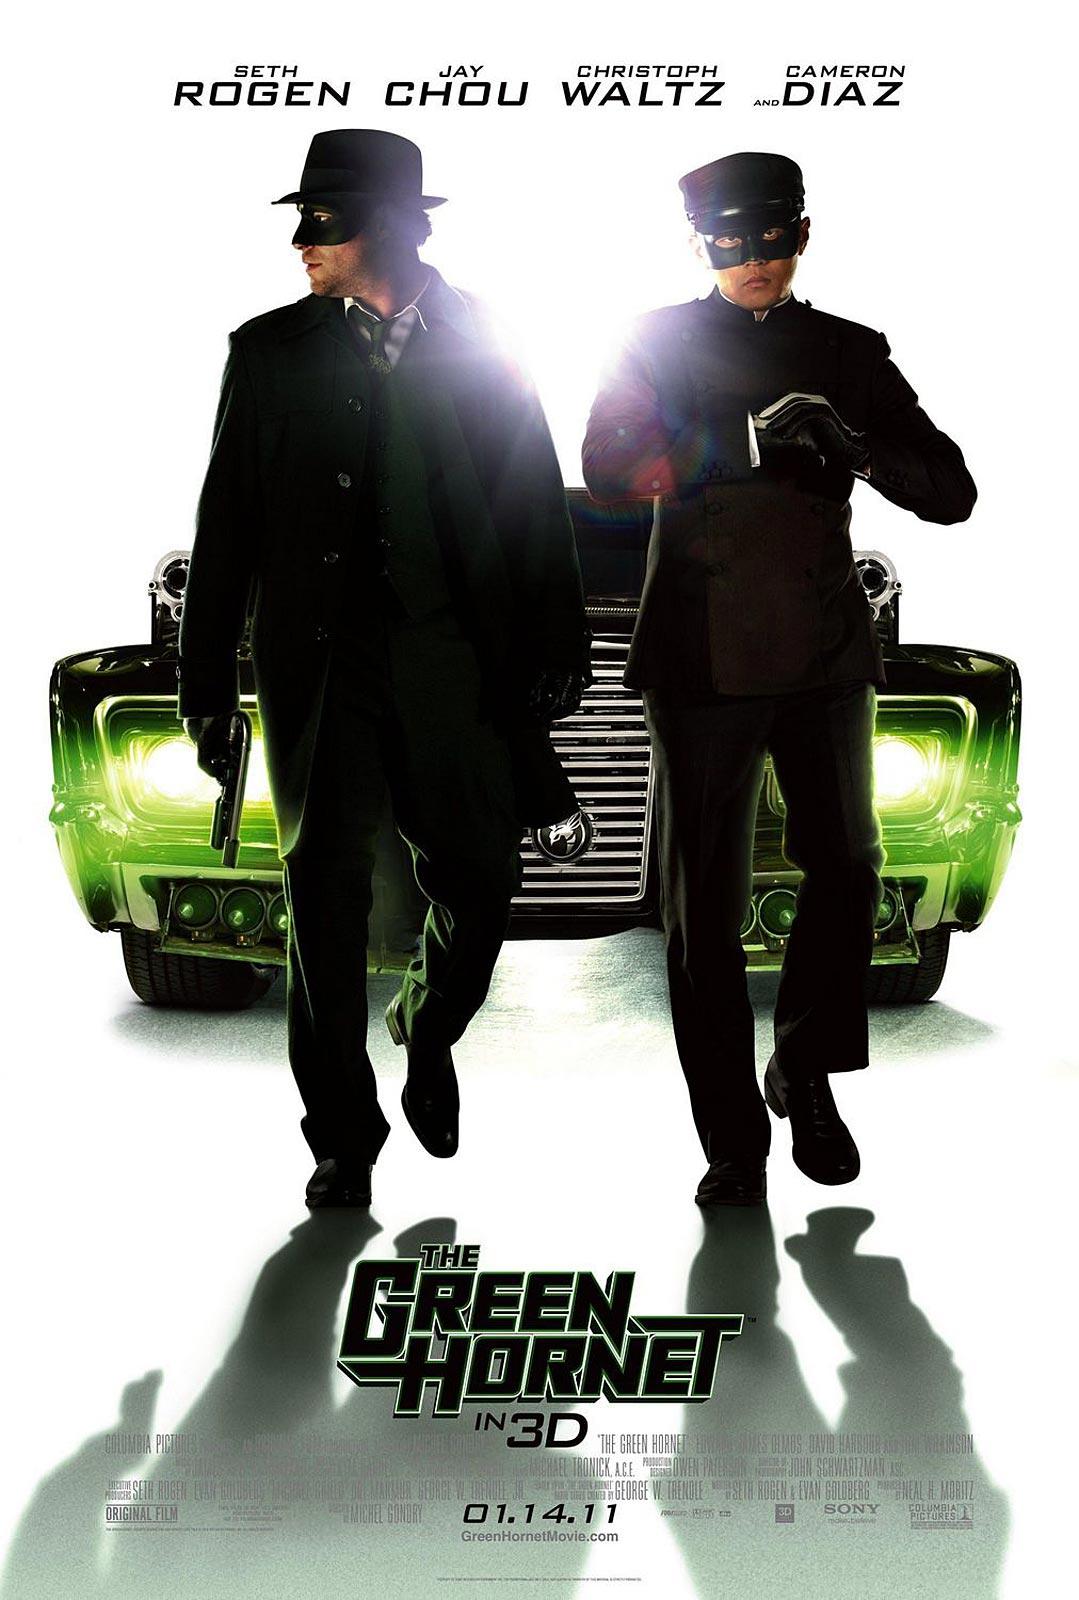 Final The Green Hornet Poster - FilmoFilia